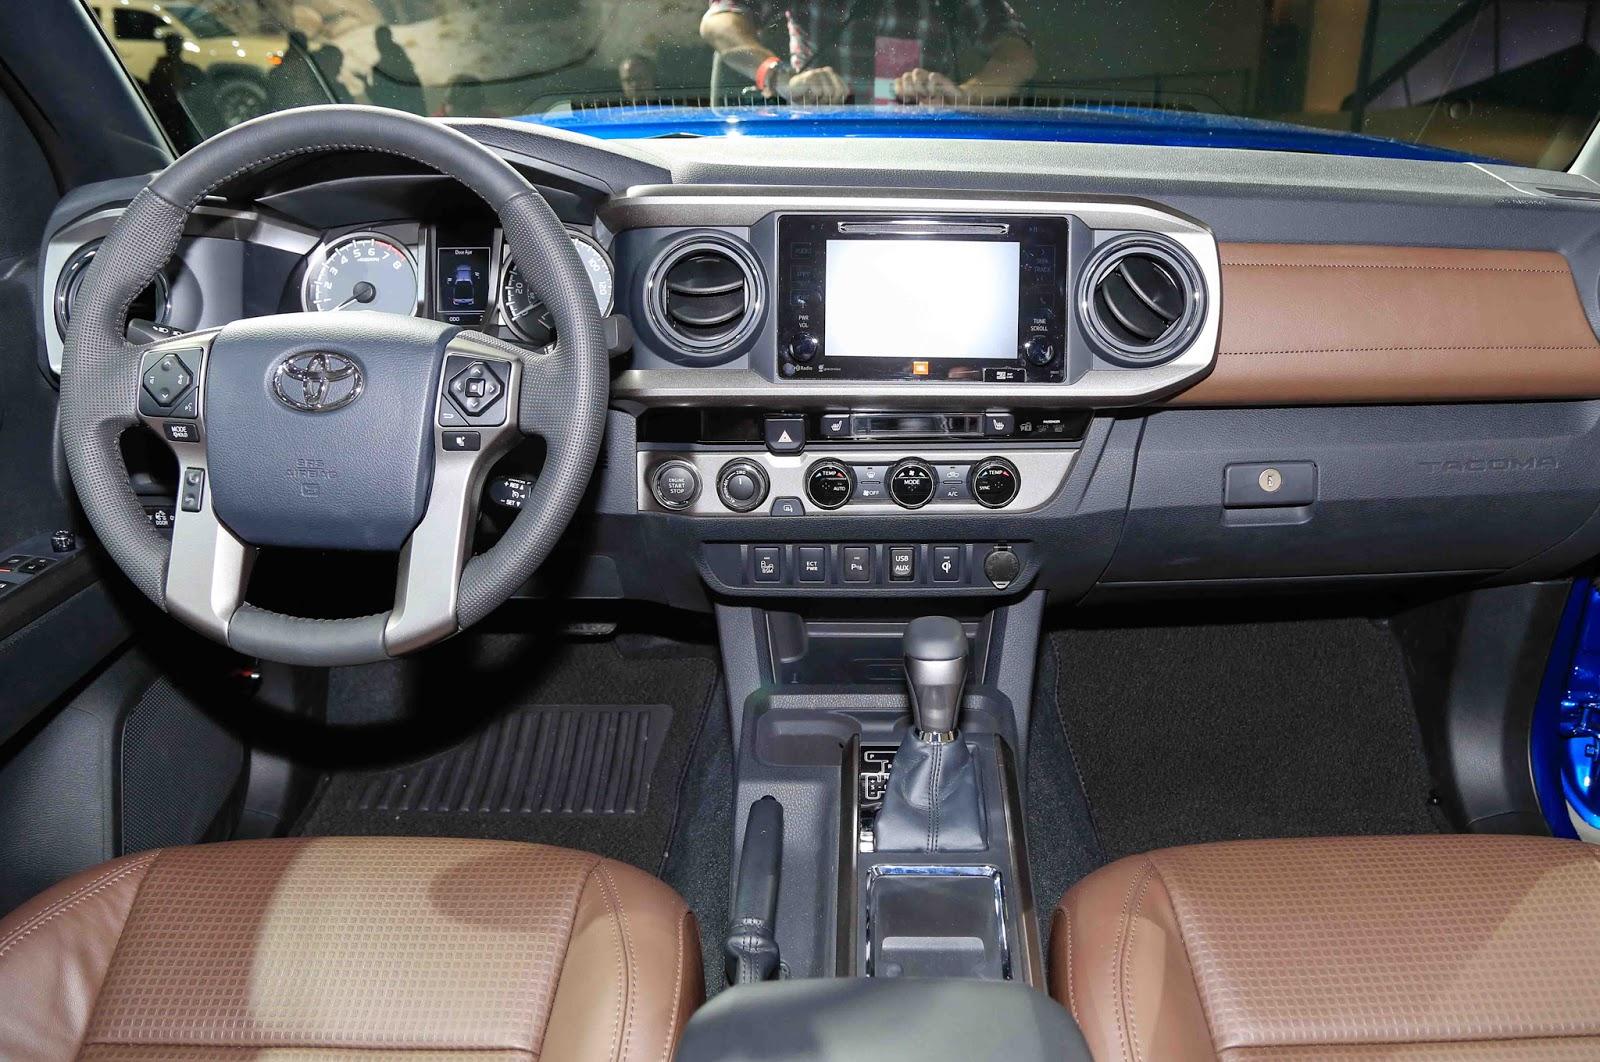 Charming 2016 Toyota Tacoma Interior Nice Look